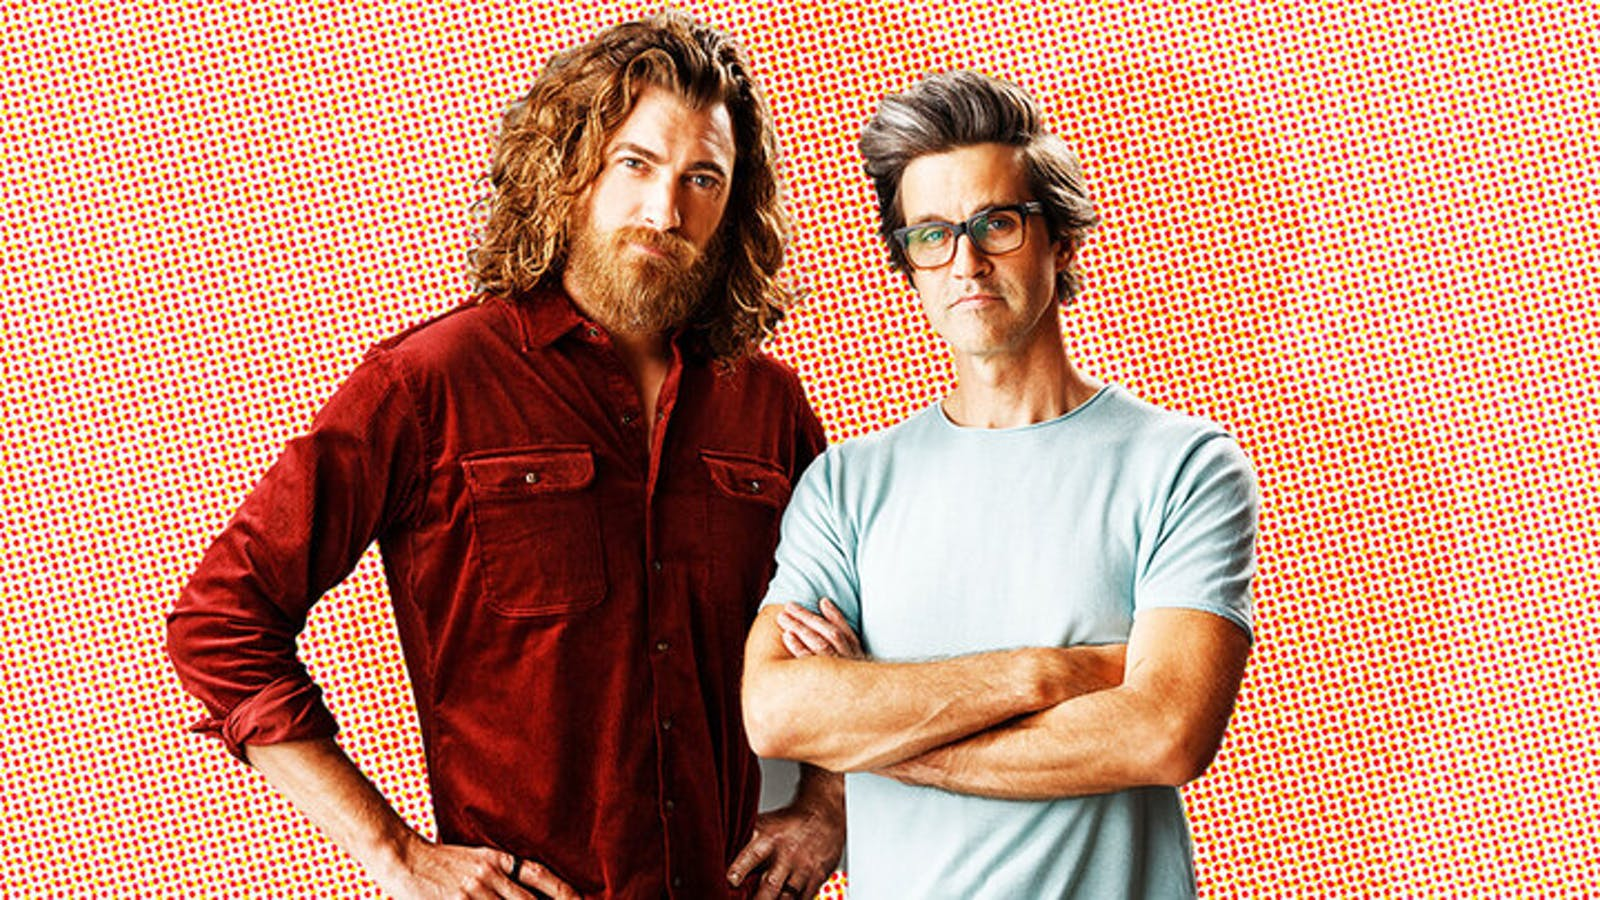 Rhett McLaughlin and Link Neal. Photo: Mythical Entertainment Illustration: Mike Sullivan